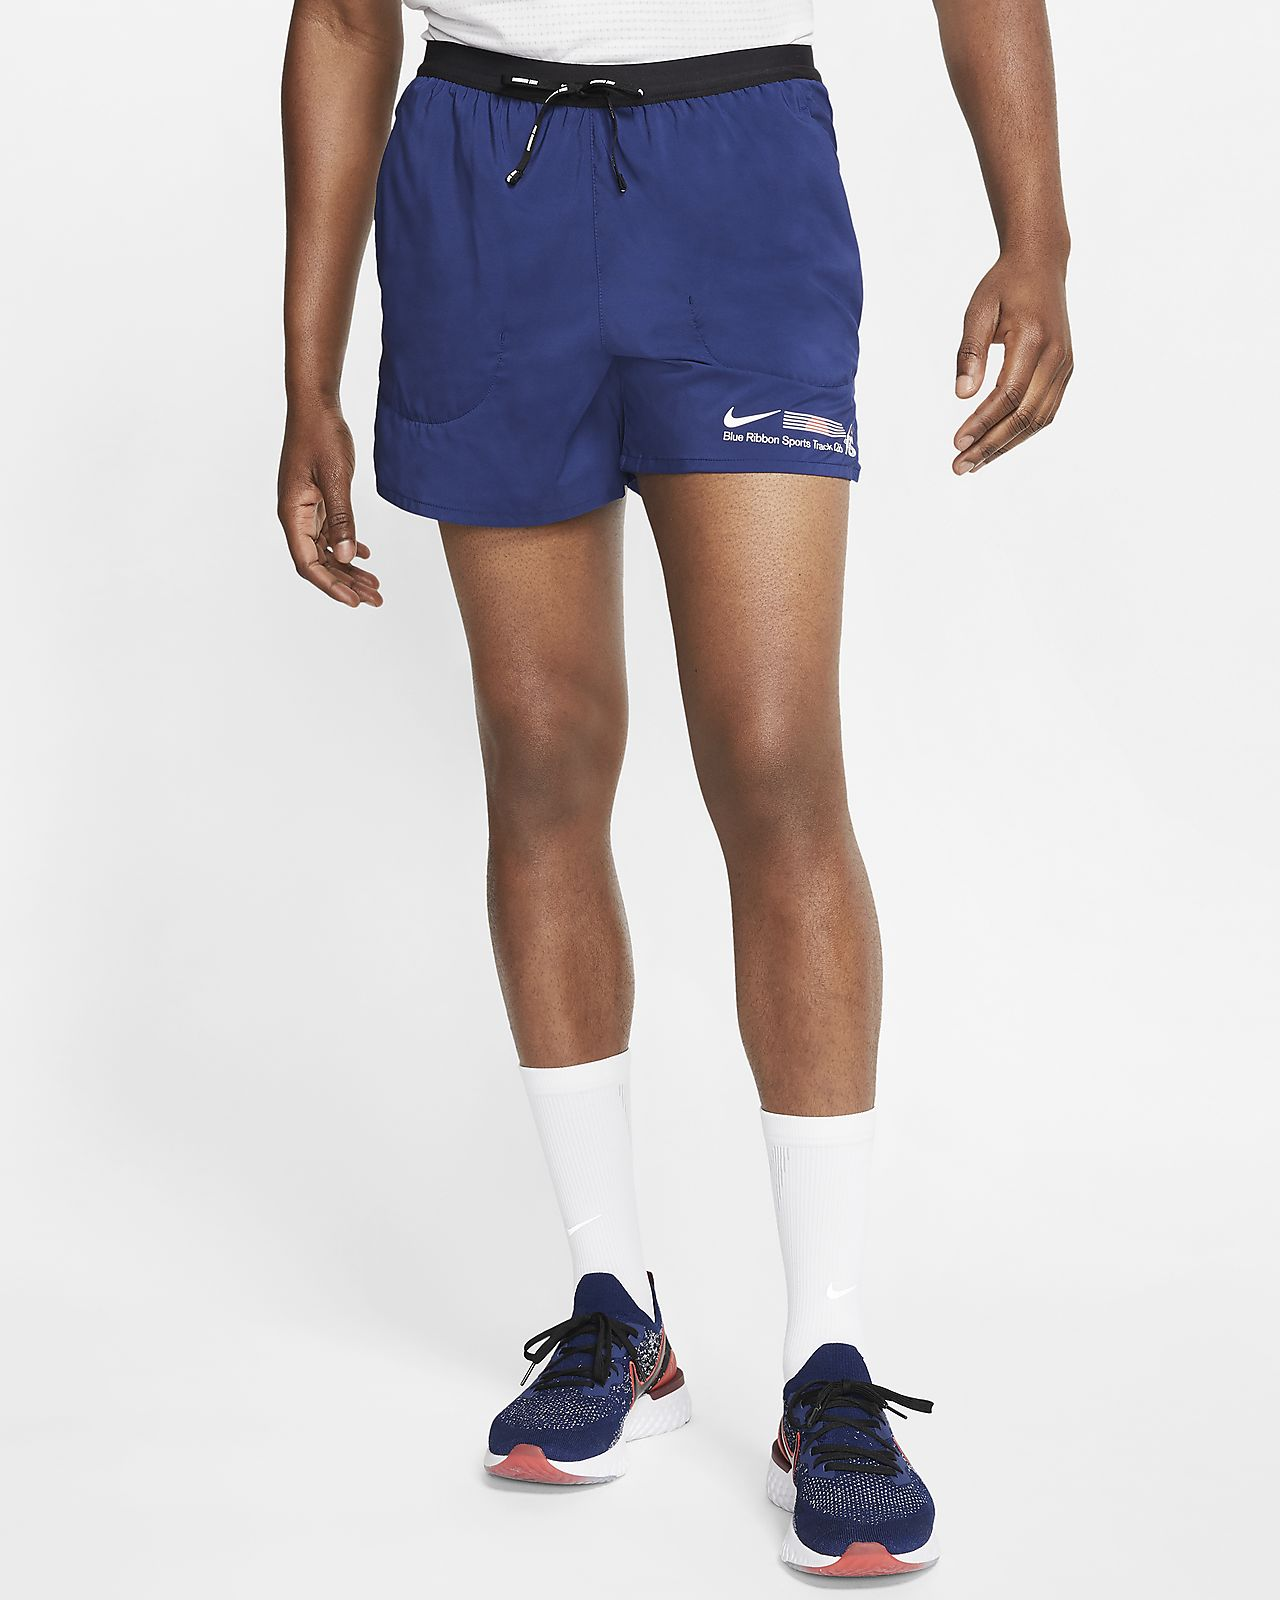 Shorts da running con slip foderati 13 cm Nike Flex Stride Blue Ribbon Sports - Uomo